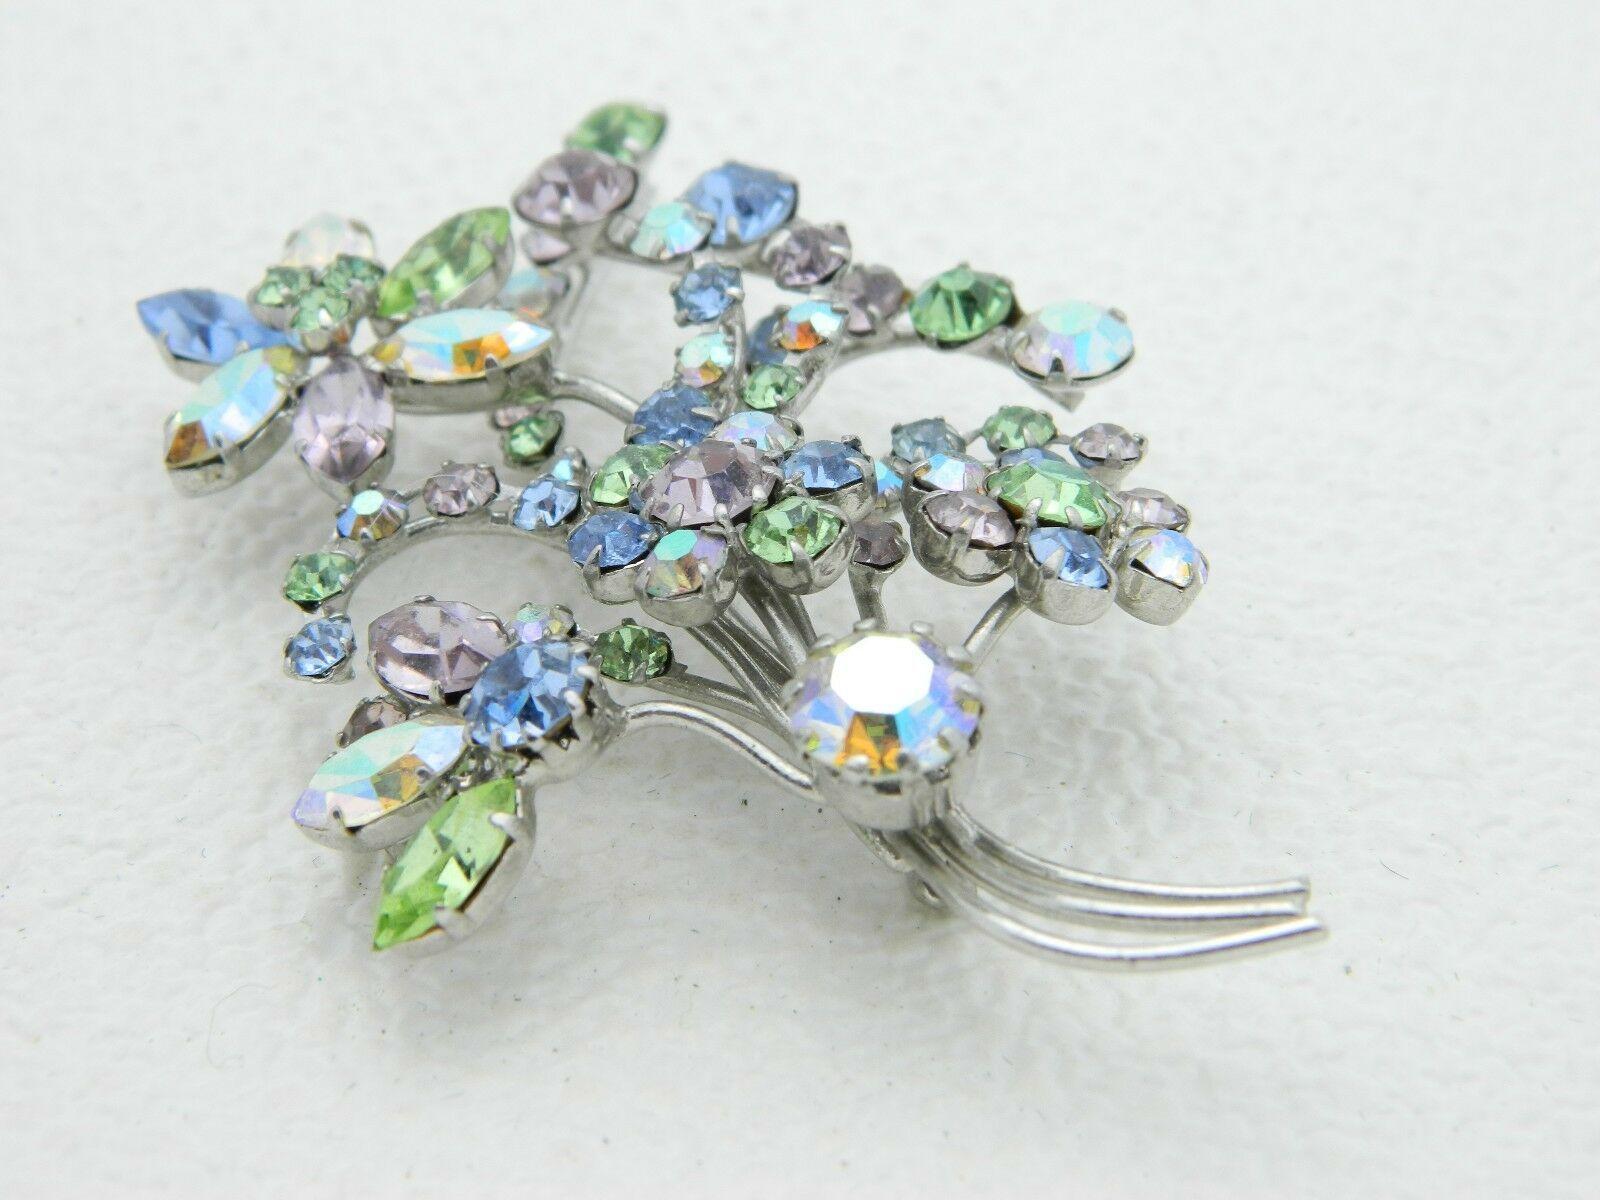 VTG AUSTRIA Signed Silver Tone Pastel AB Crystal Rhinestone Large Flower Brooch